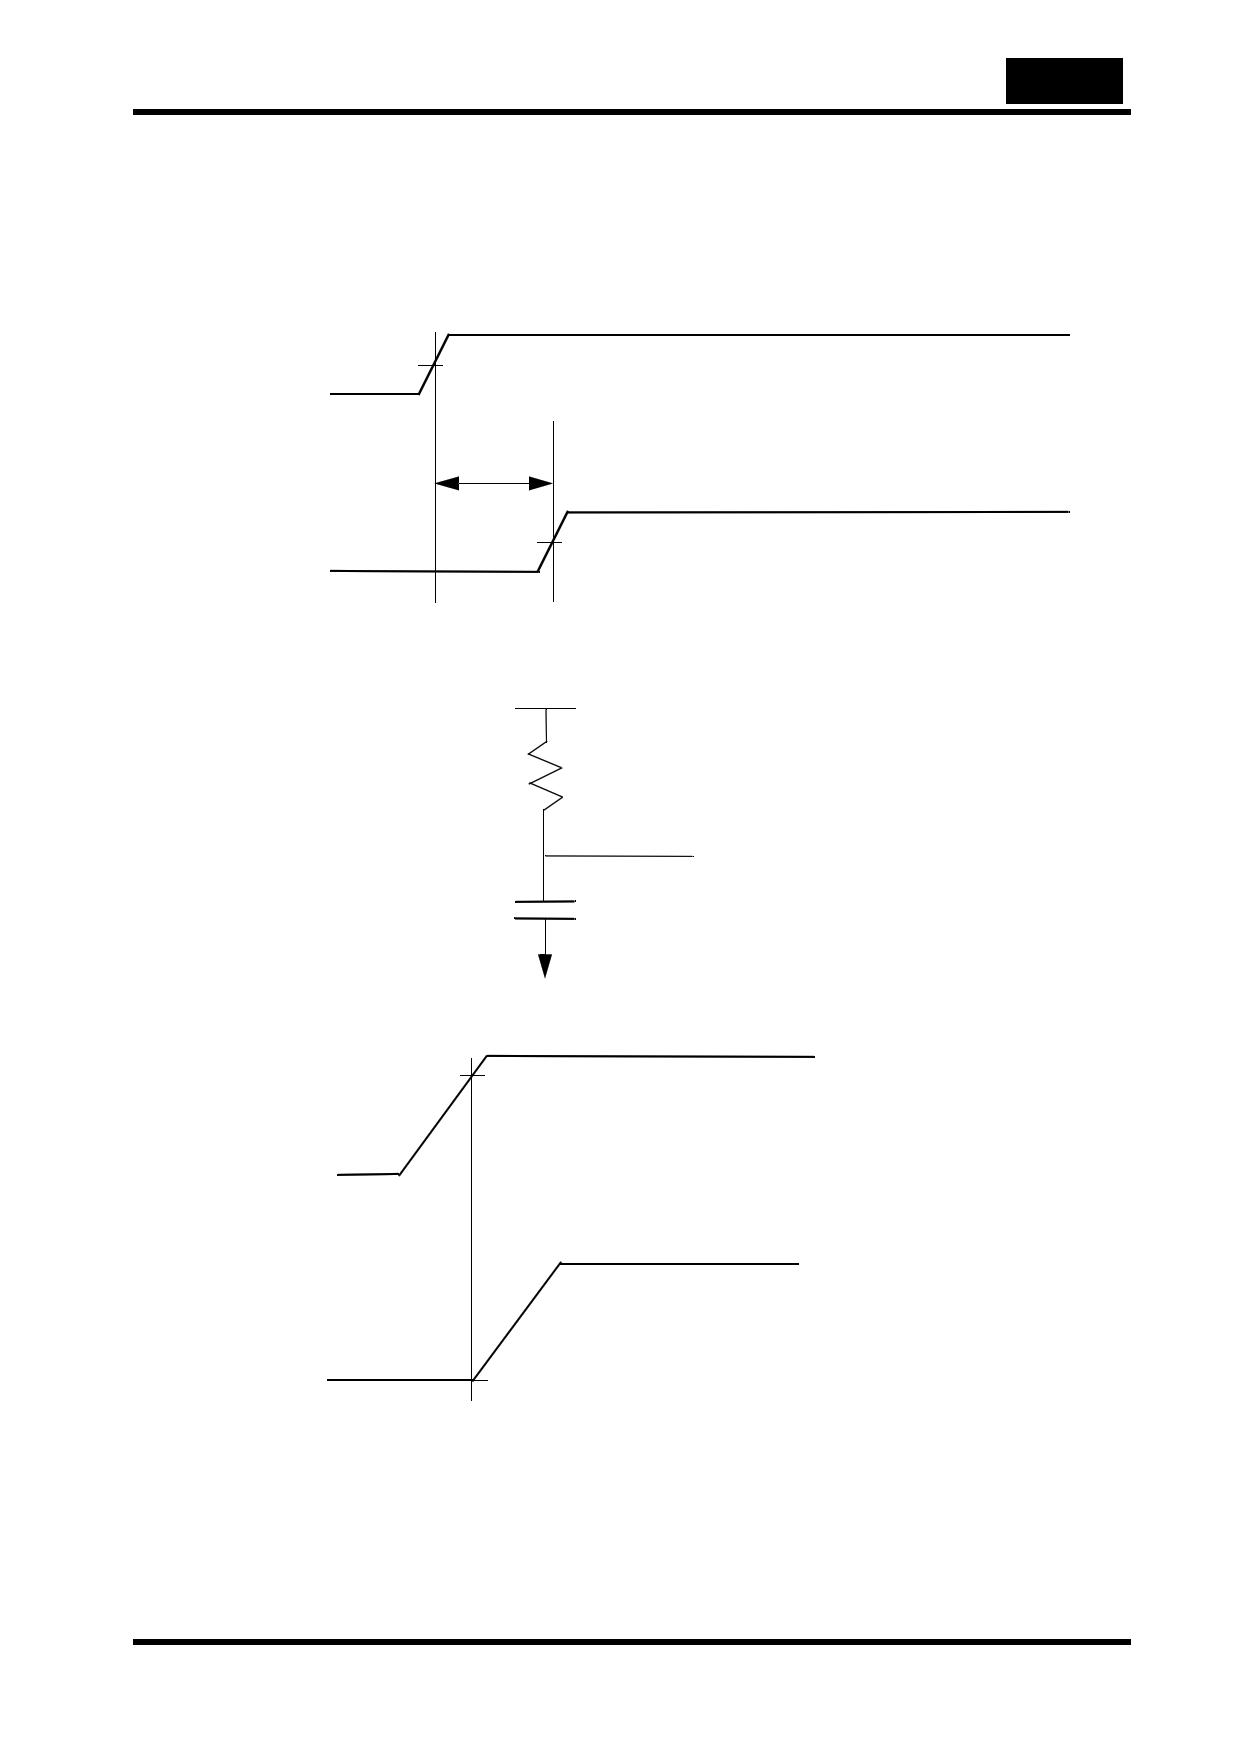 THC63LVD104A transistor, diode fet, igbt, scr